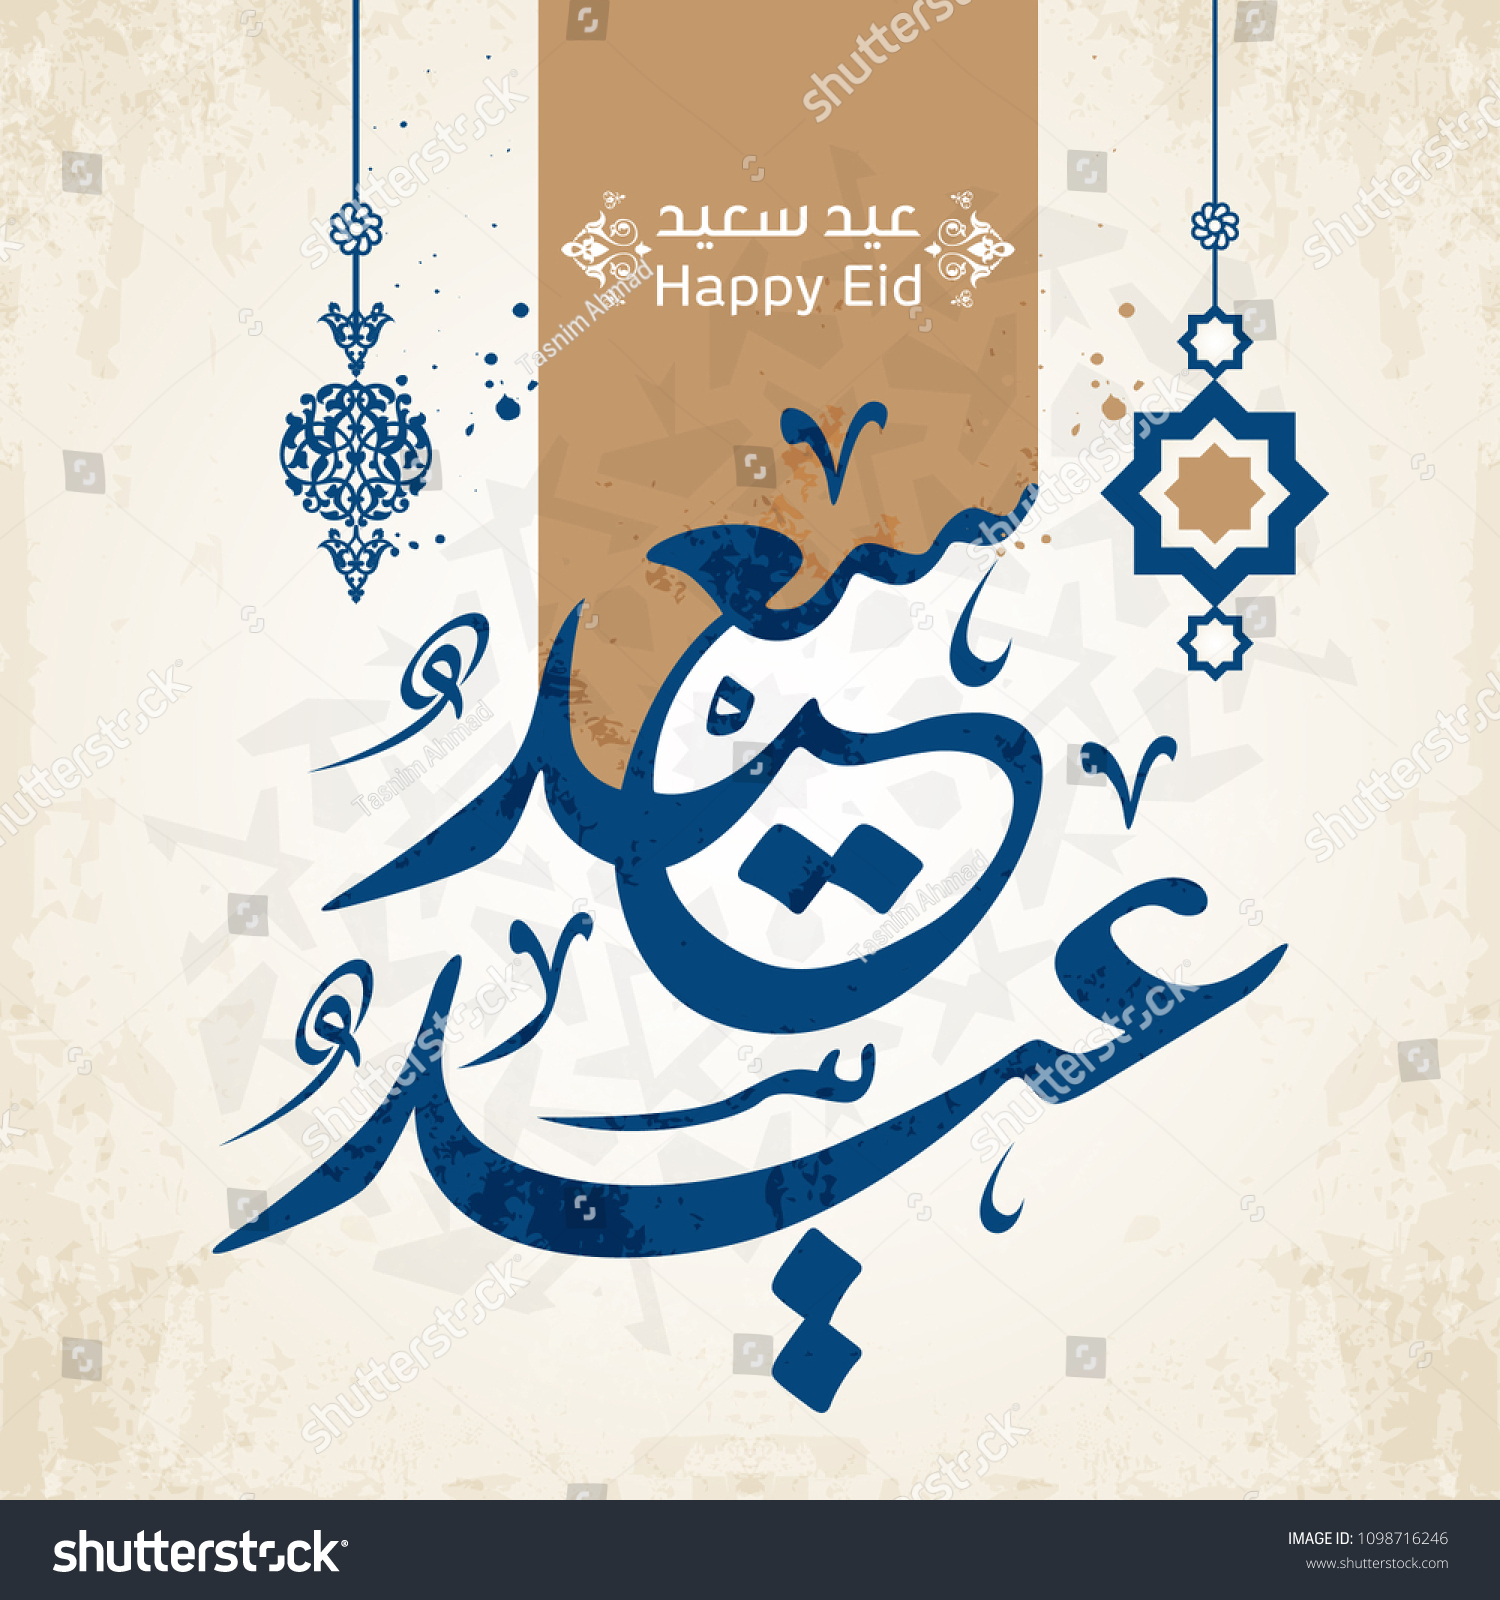 Happy Eid Arabic Calligraphy Greetings You Stock Vector Royalty